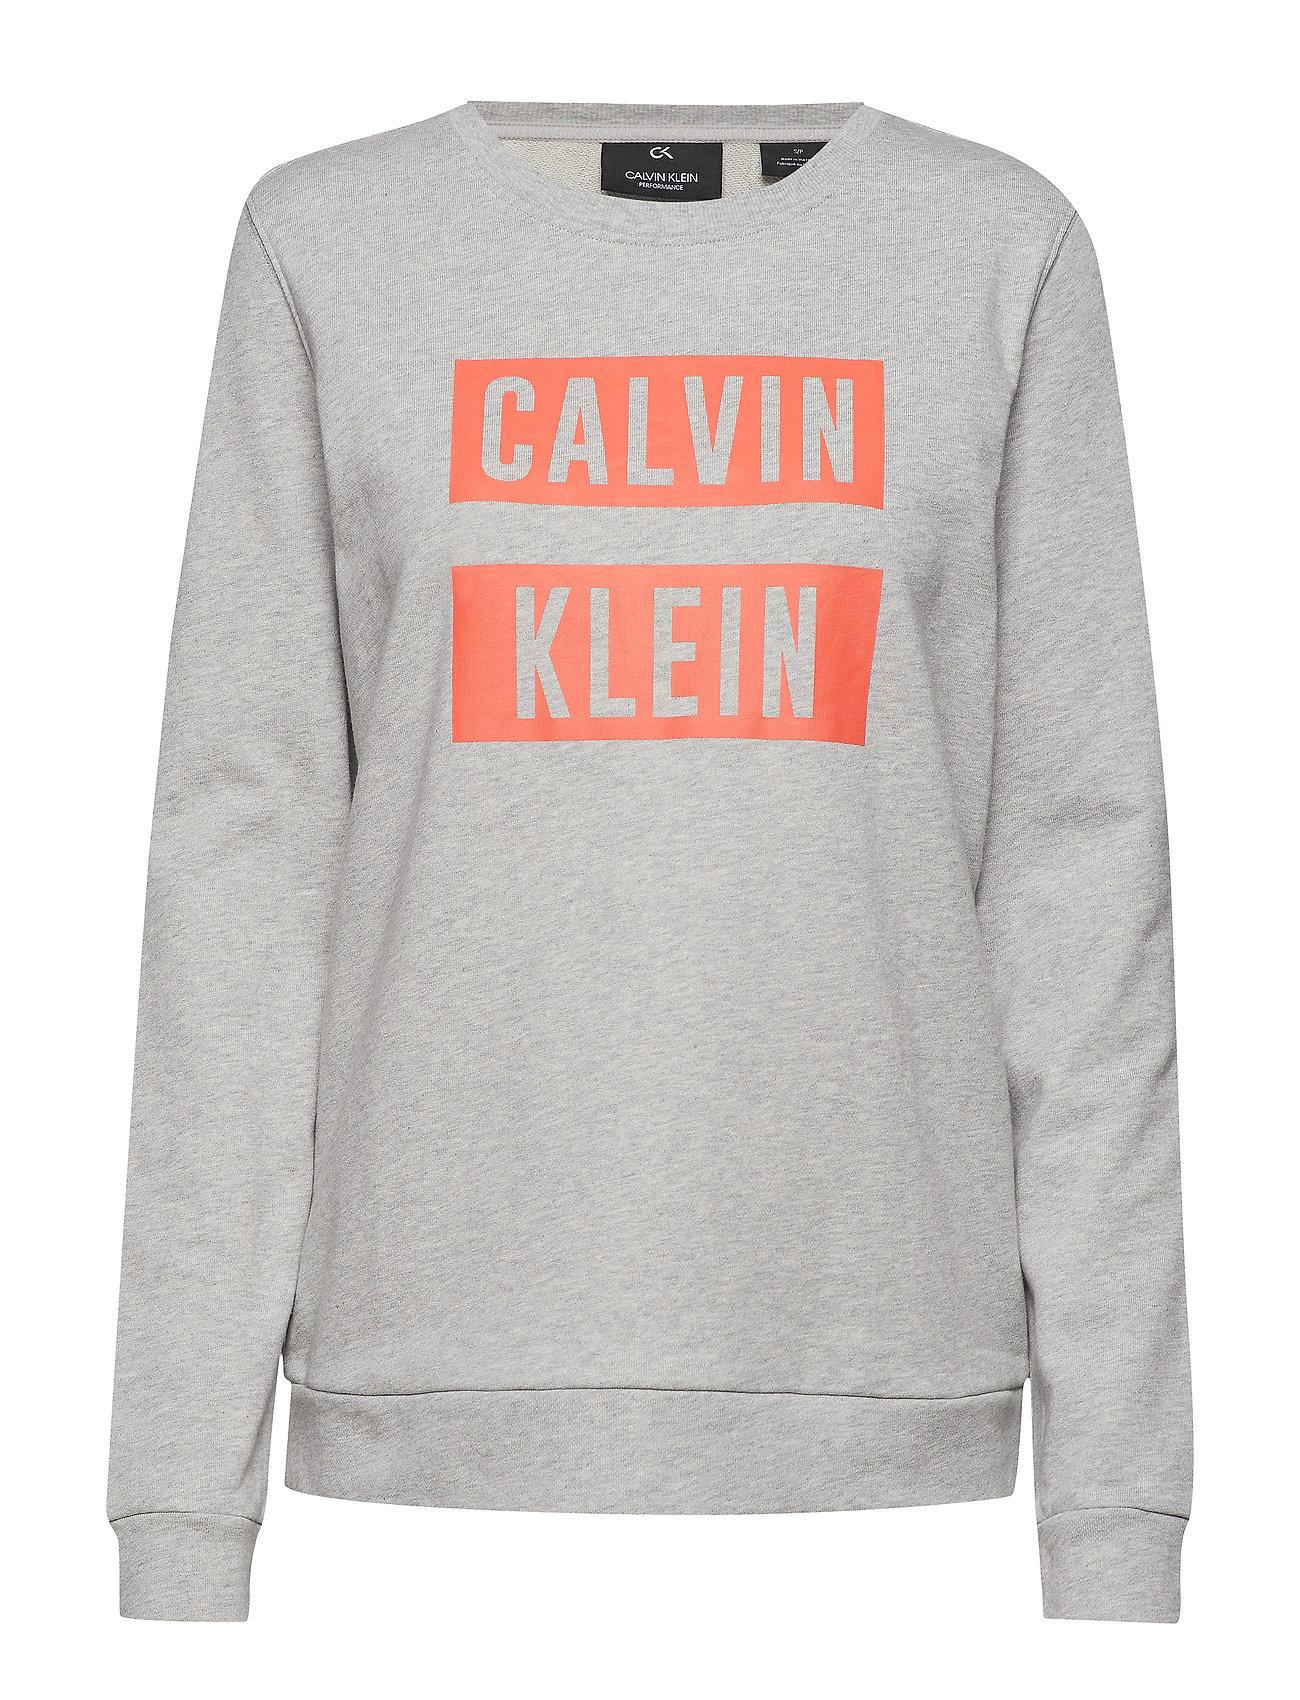 Grey hot Heather Pulloverlight Logo CoralCalvin Performance Klein W2HE9YID